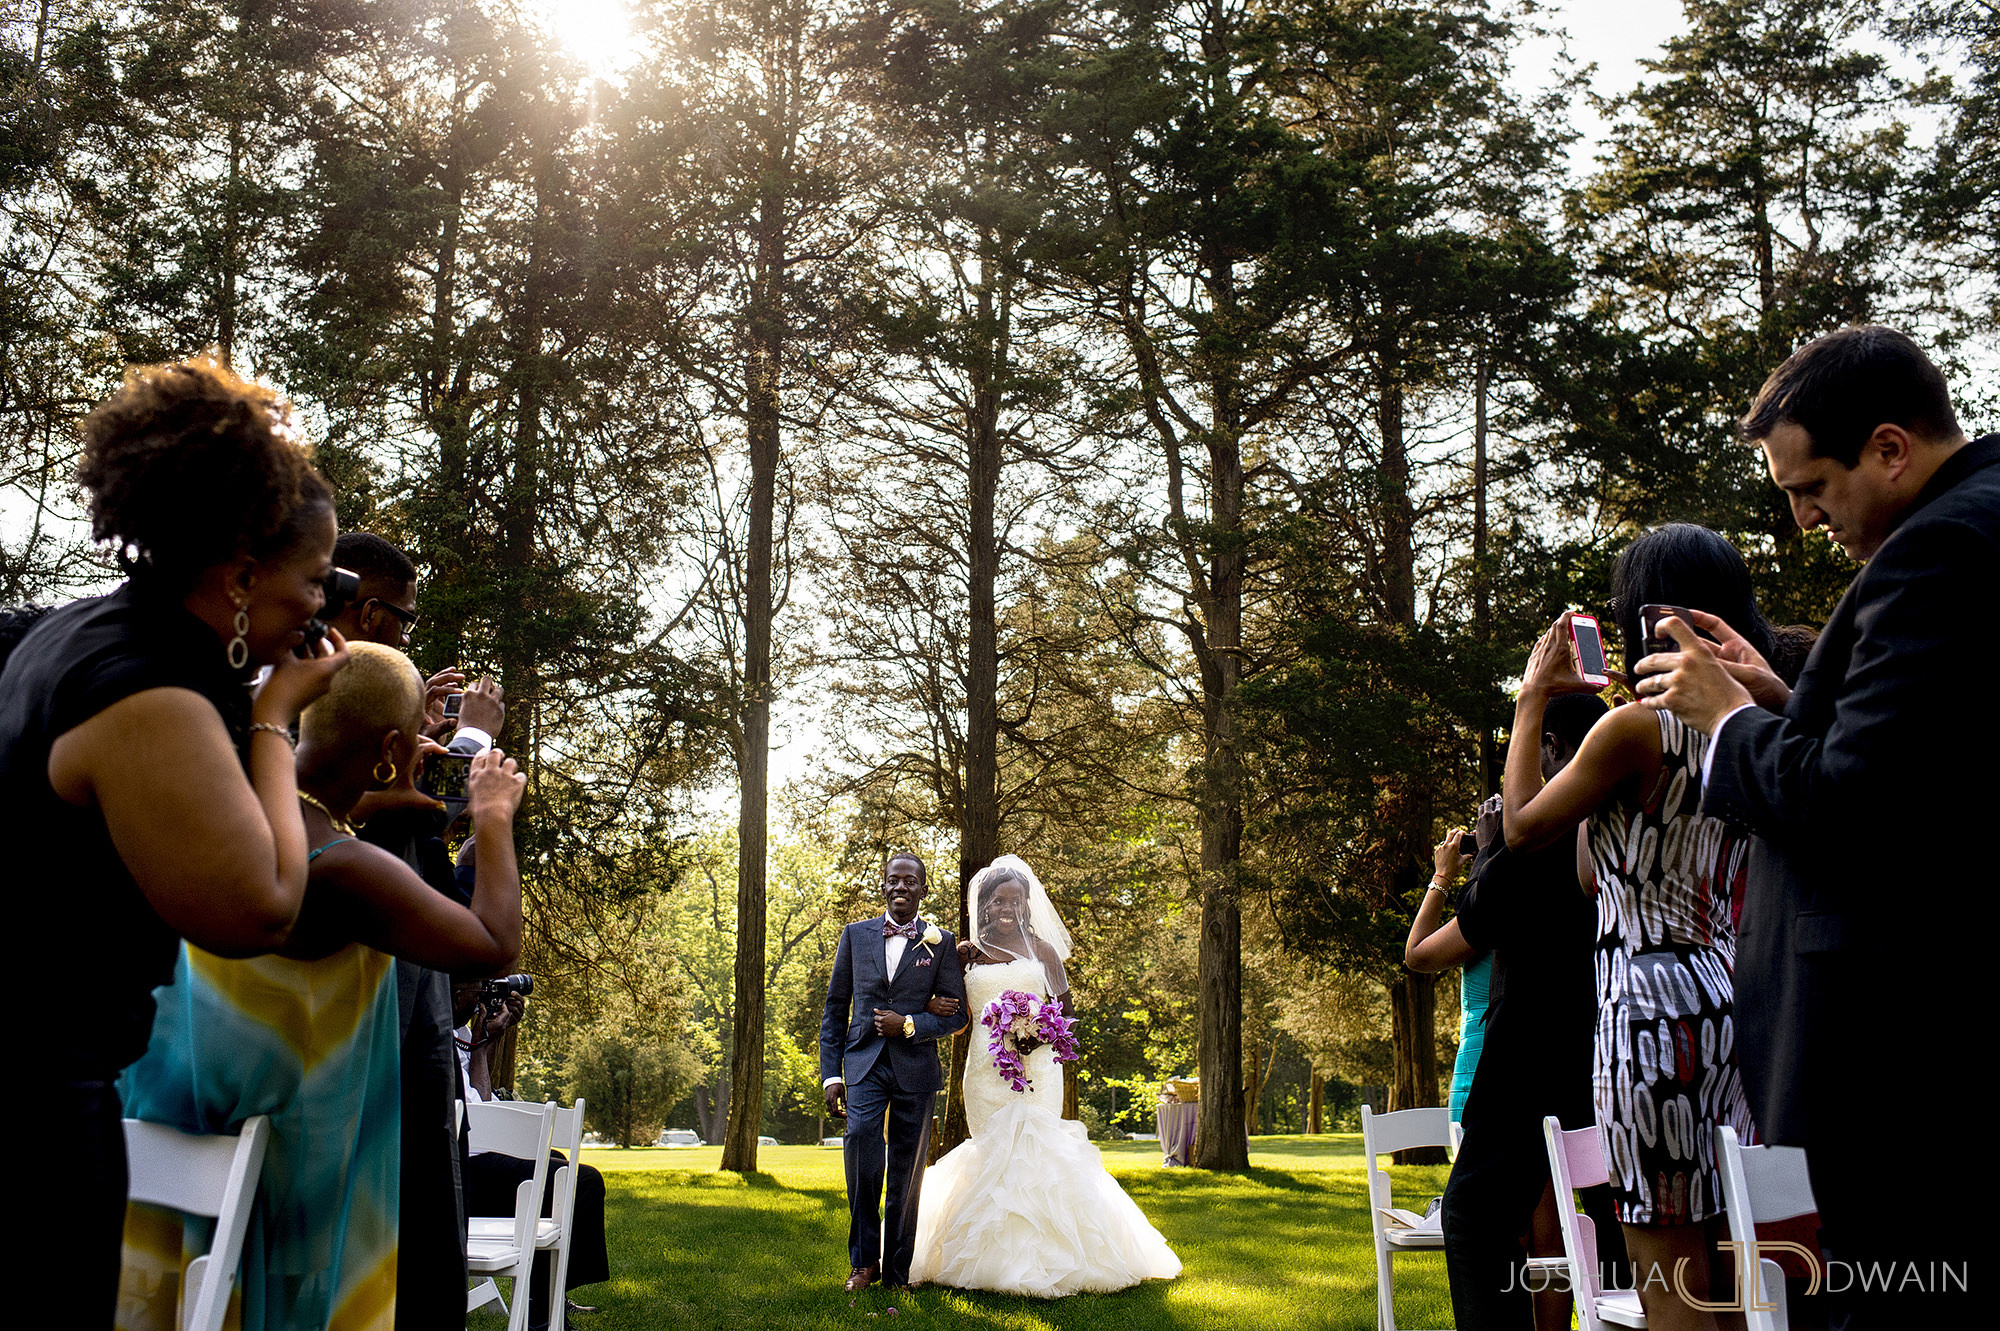 nancy-jason-007-wadsworth-estates-middletown-ct-wedding-photographer-joshua-dwain-photography-